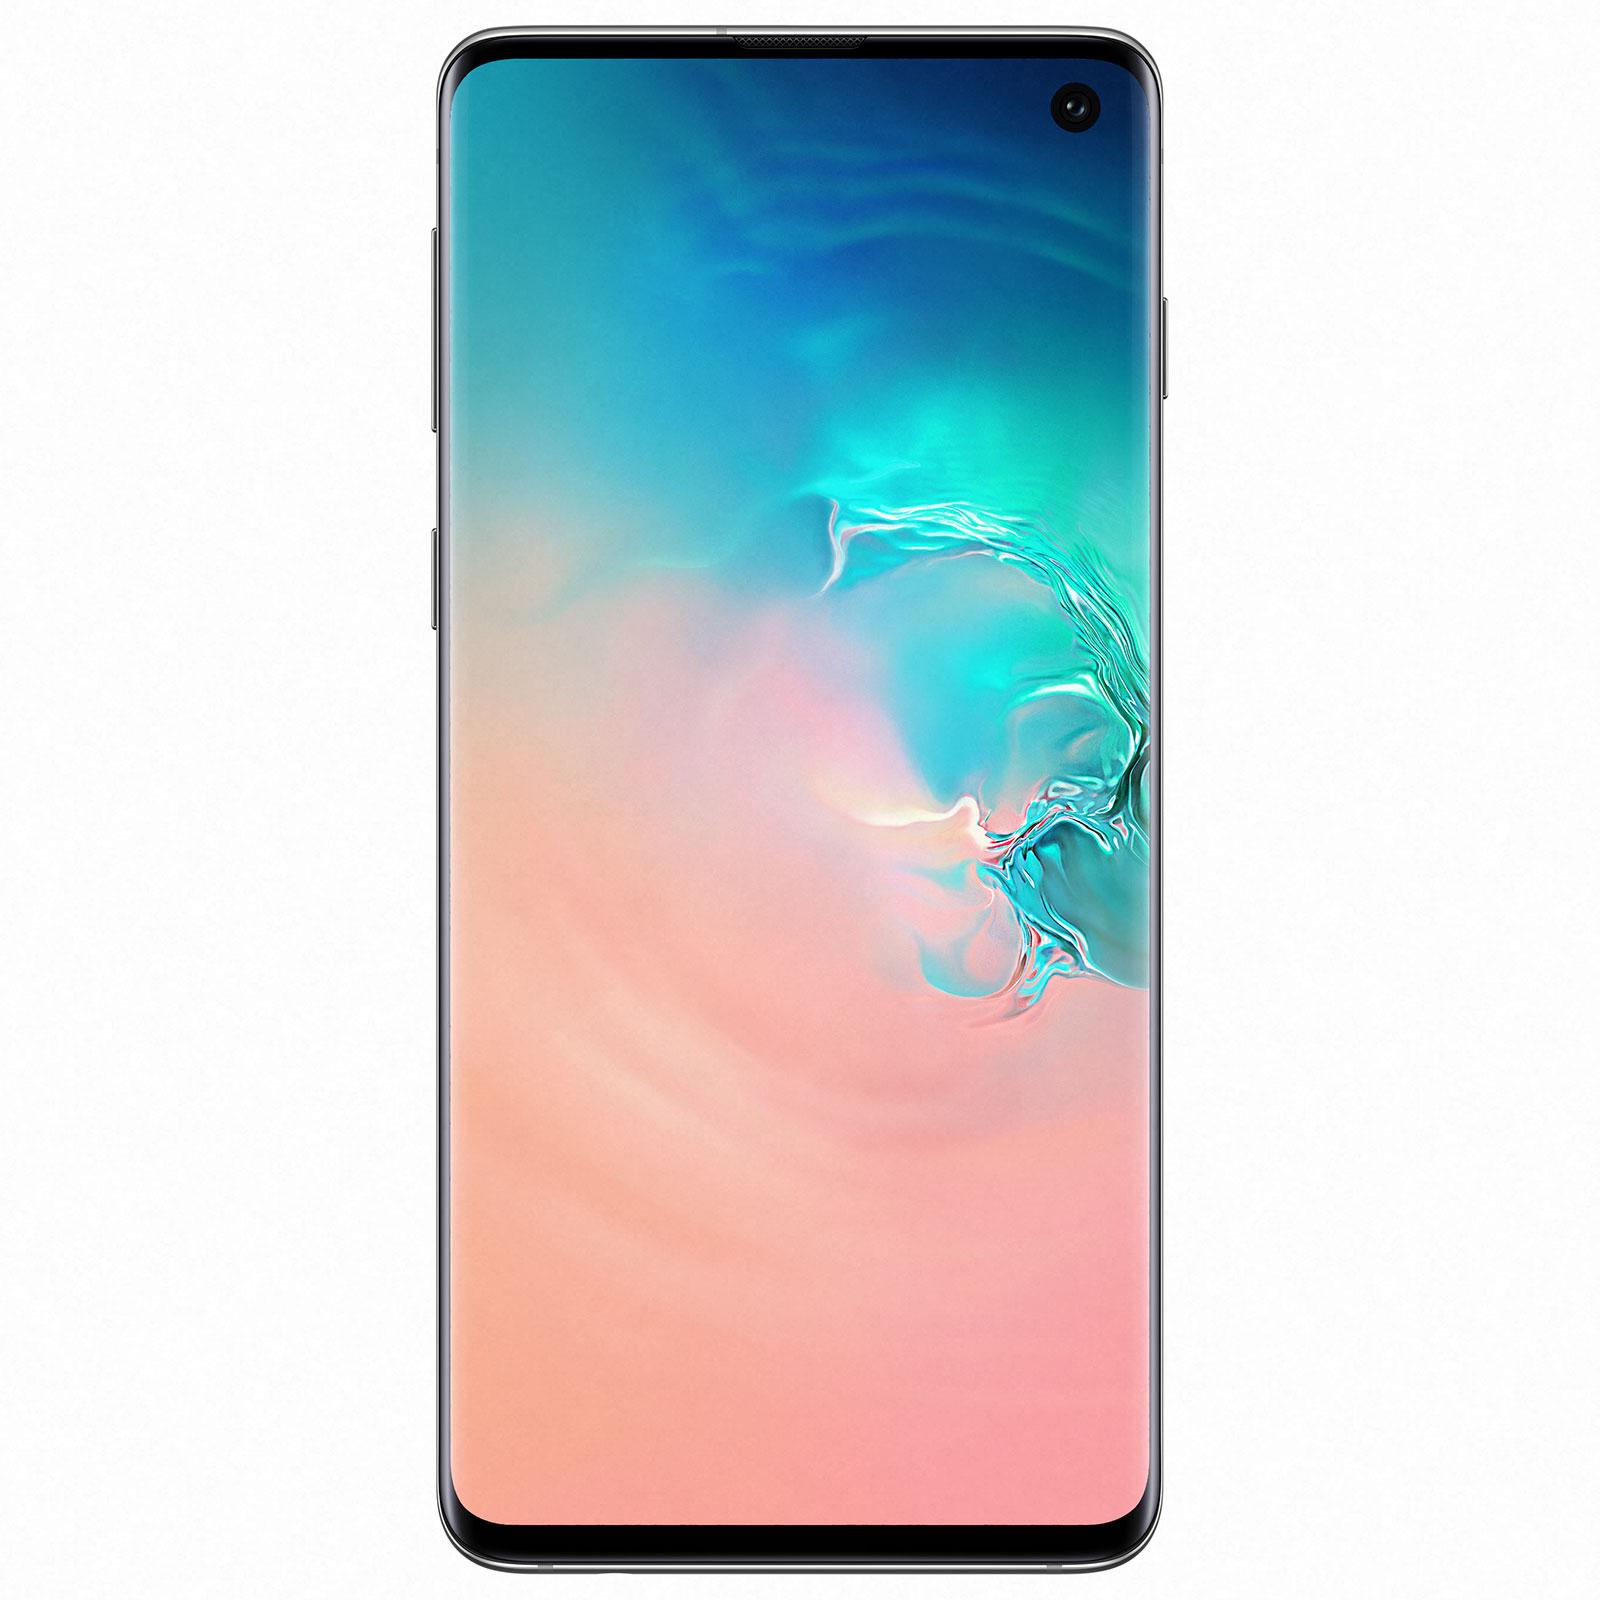 "Mobile & smartphone Samsung Galaxy S10 SM-G973F Blanc Prisme (8 Go / 512 Go) Smartphone 4G-LTE Advanced Dual SIM IP68 - Exynos 9820 8-Core 2.8 GHz - RAM 8 Go - Ecran tactile Super AMOLED 6.1"" 1440 x 3040 - 512 Go - NFC/Bluetooth 5.0 - 3400 mAh - Android 9.0"